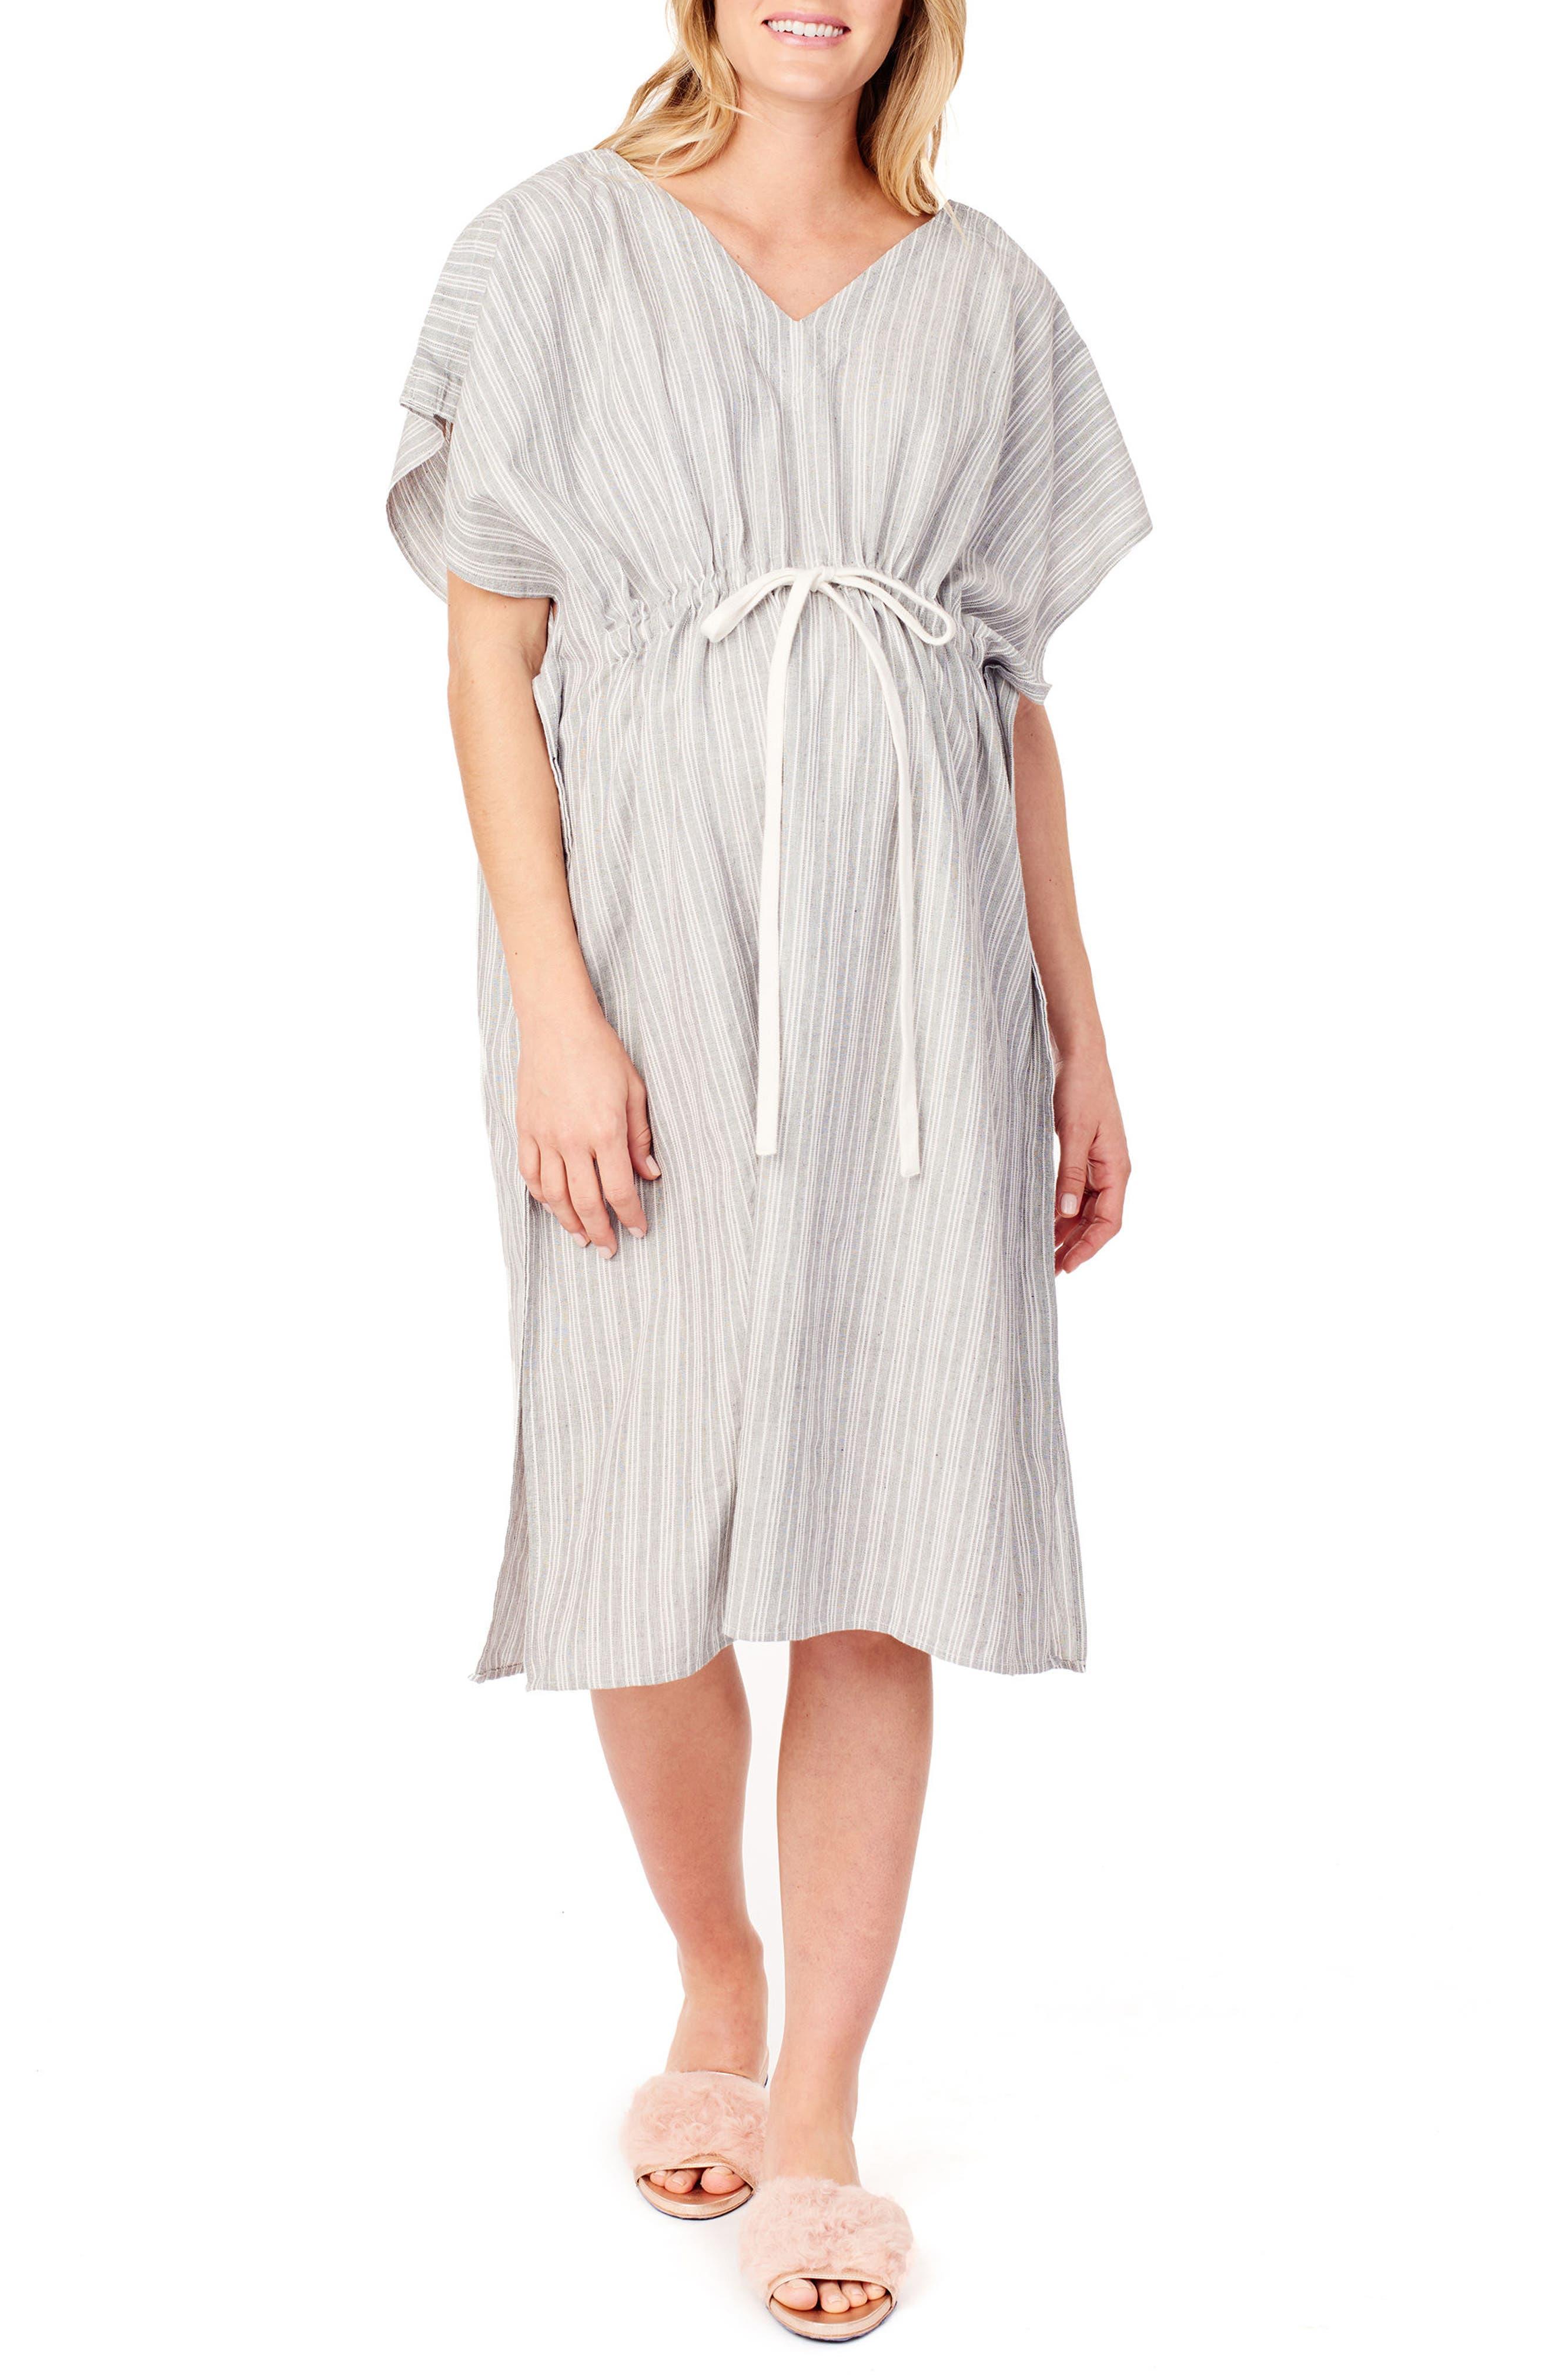 x James Fox & Co. Maternity/Nursing Hospital Gown,                             Main thumbnail 1, color,                             BLACK/ WHITE DOBBY STRIPE